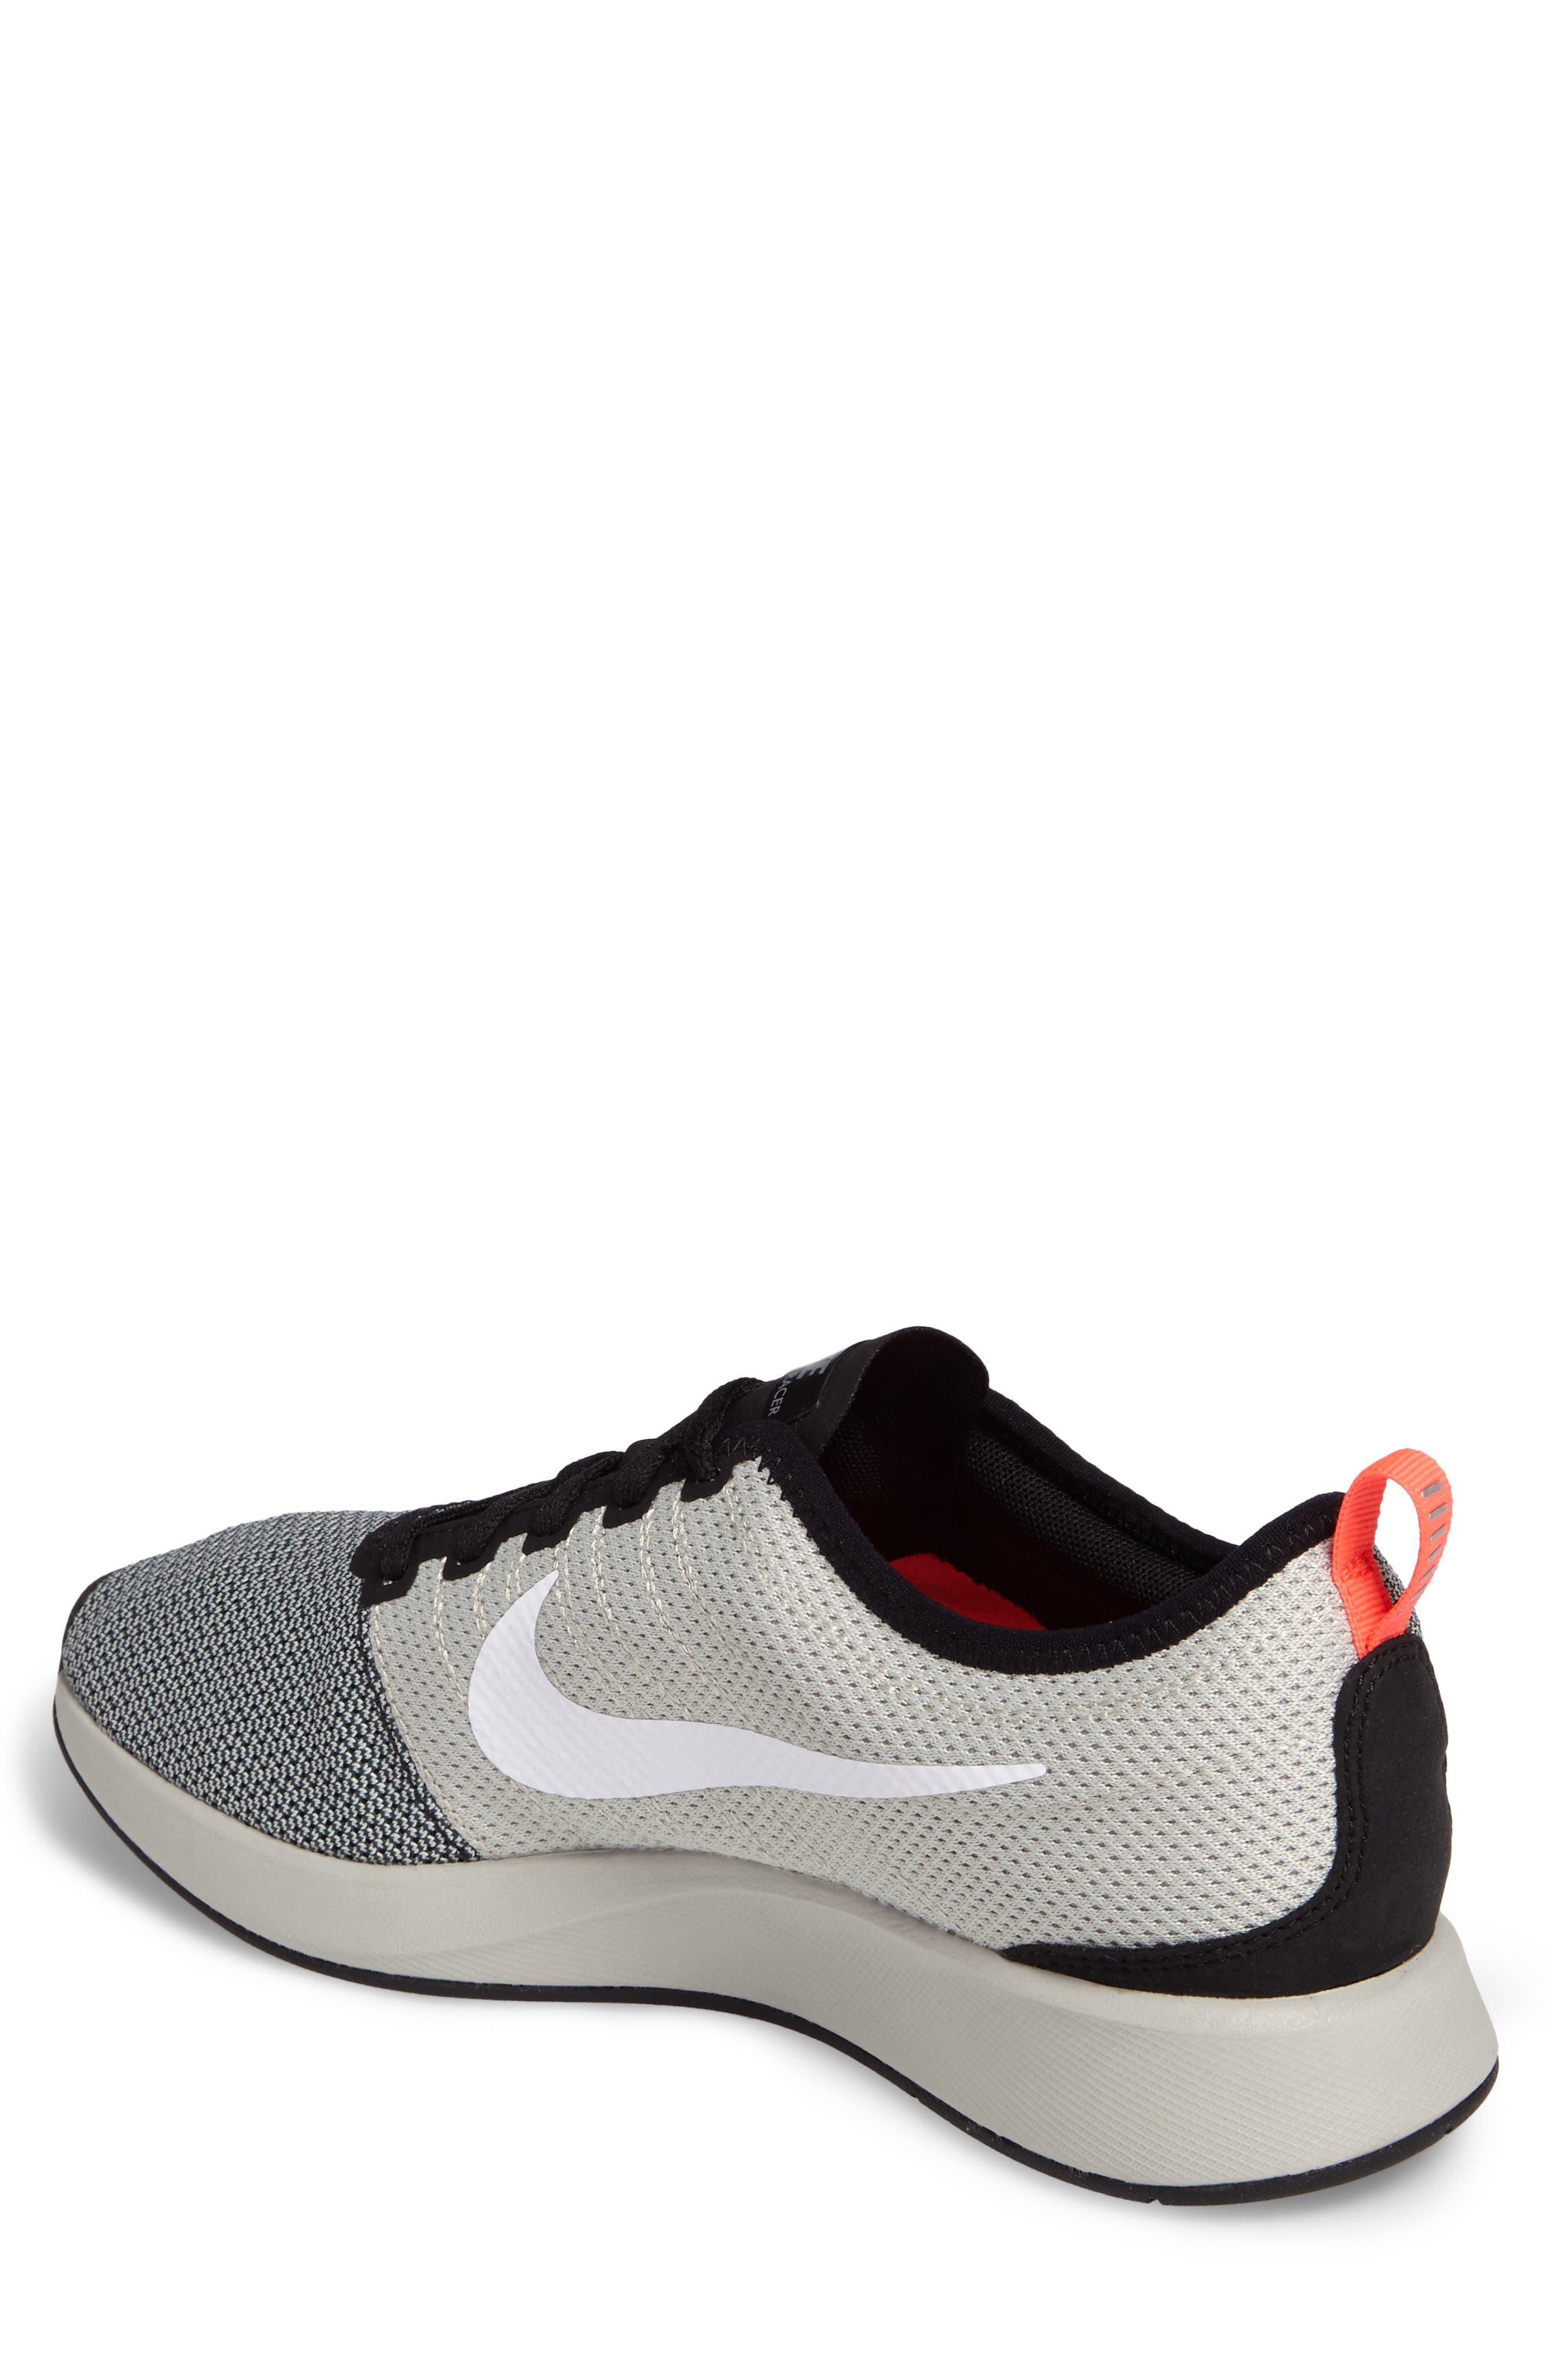 Alternate Image 2  - Nike Dualtone Racer Running Shoe (Men)